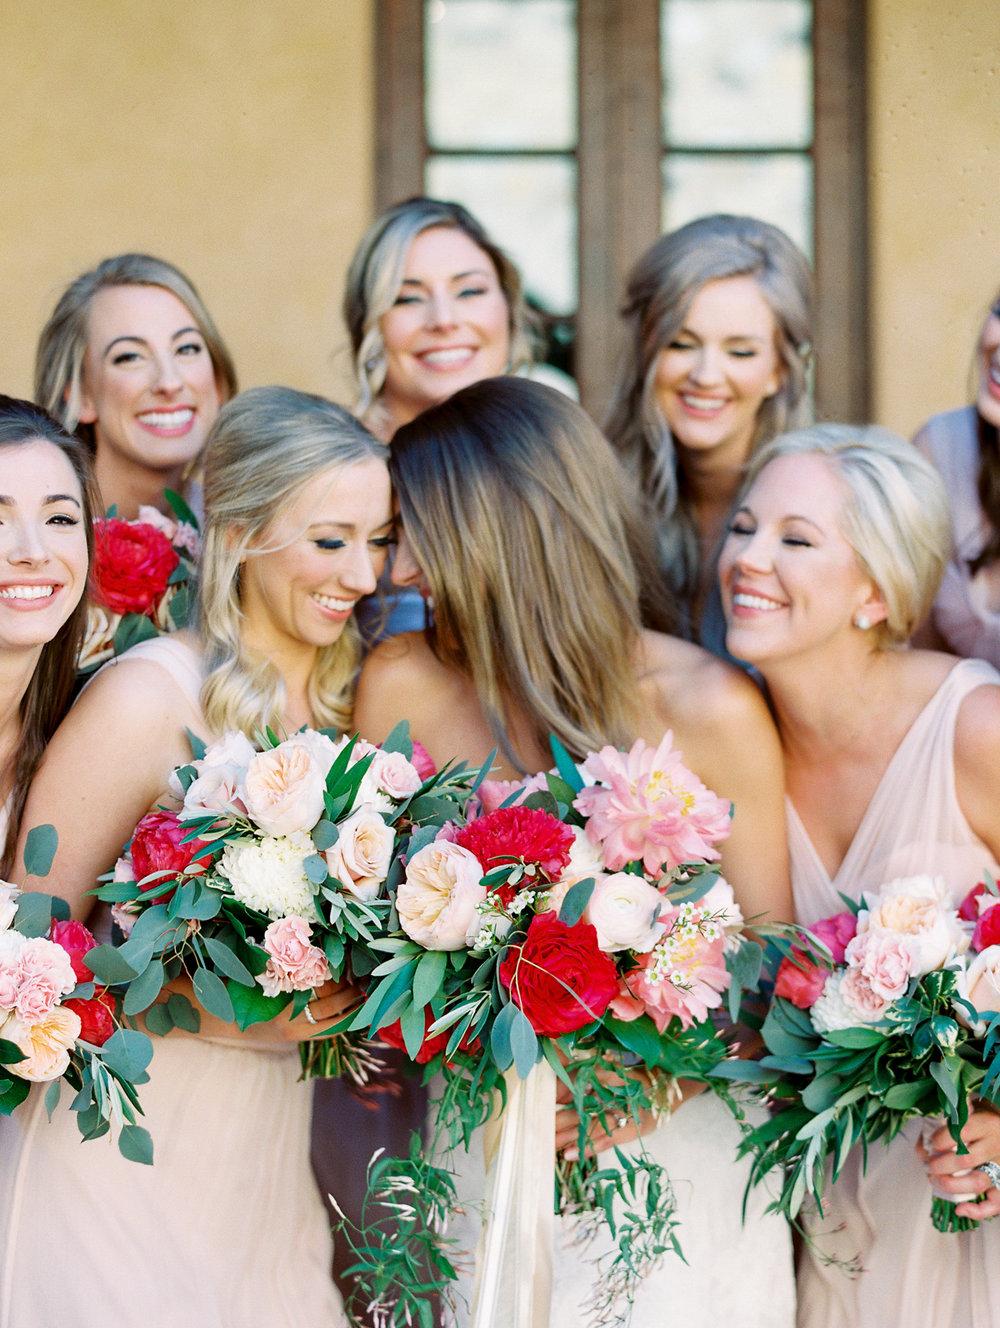 Escondido-Golf_Lake-Club-Hill-Country-Houston-Wedding-Photographer-Best-Top-Luxury-Destination-Engagements-Portrait-Austin-Photography-15.jpg